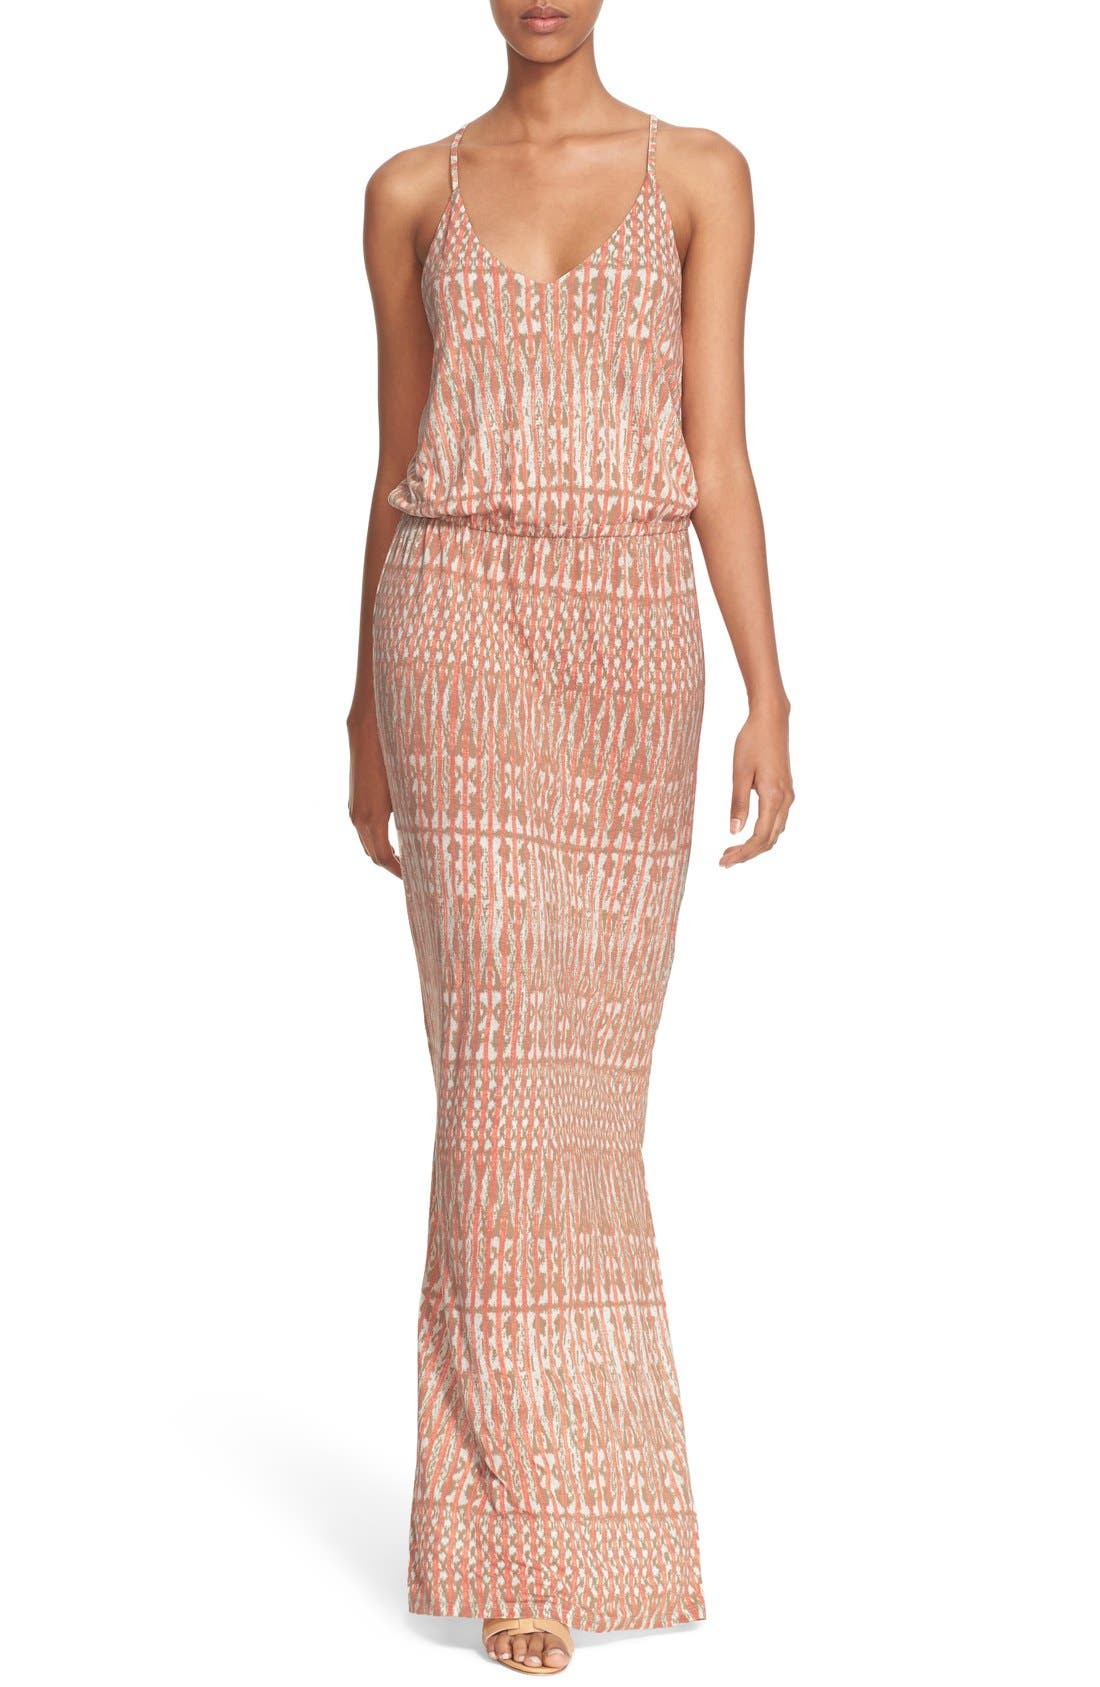 Alternate Image 1 Selected - Joie 'Nahia' Ikat Print Blouson Maxi Dress